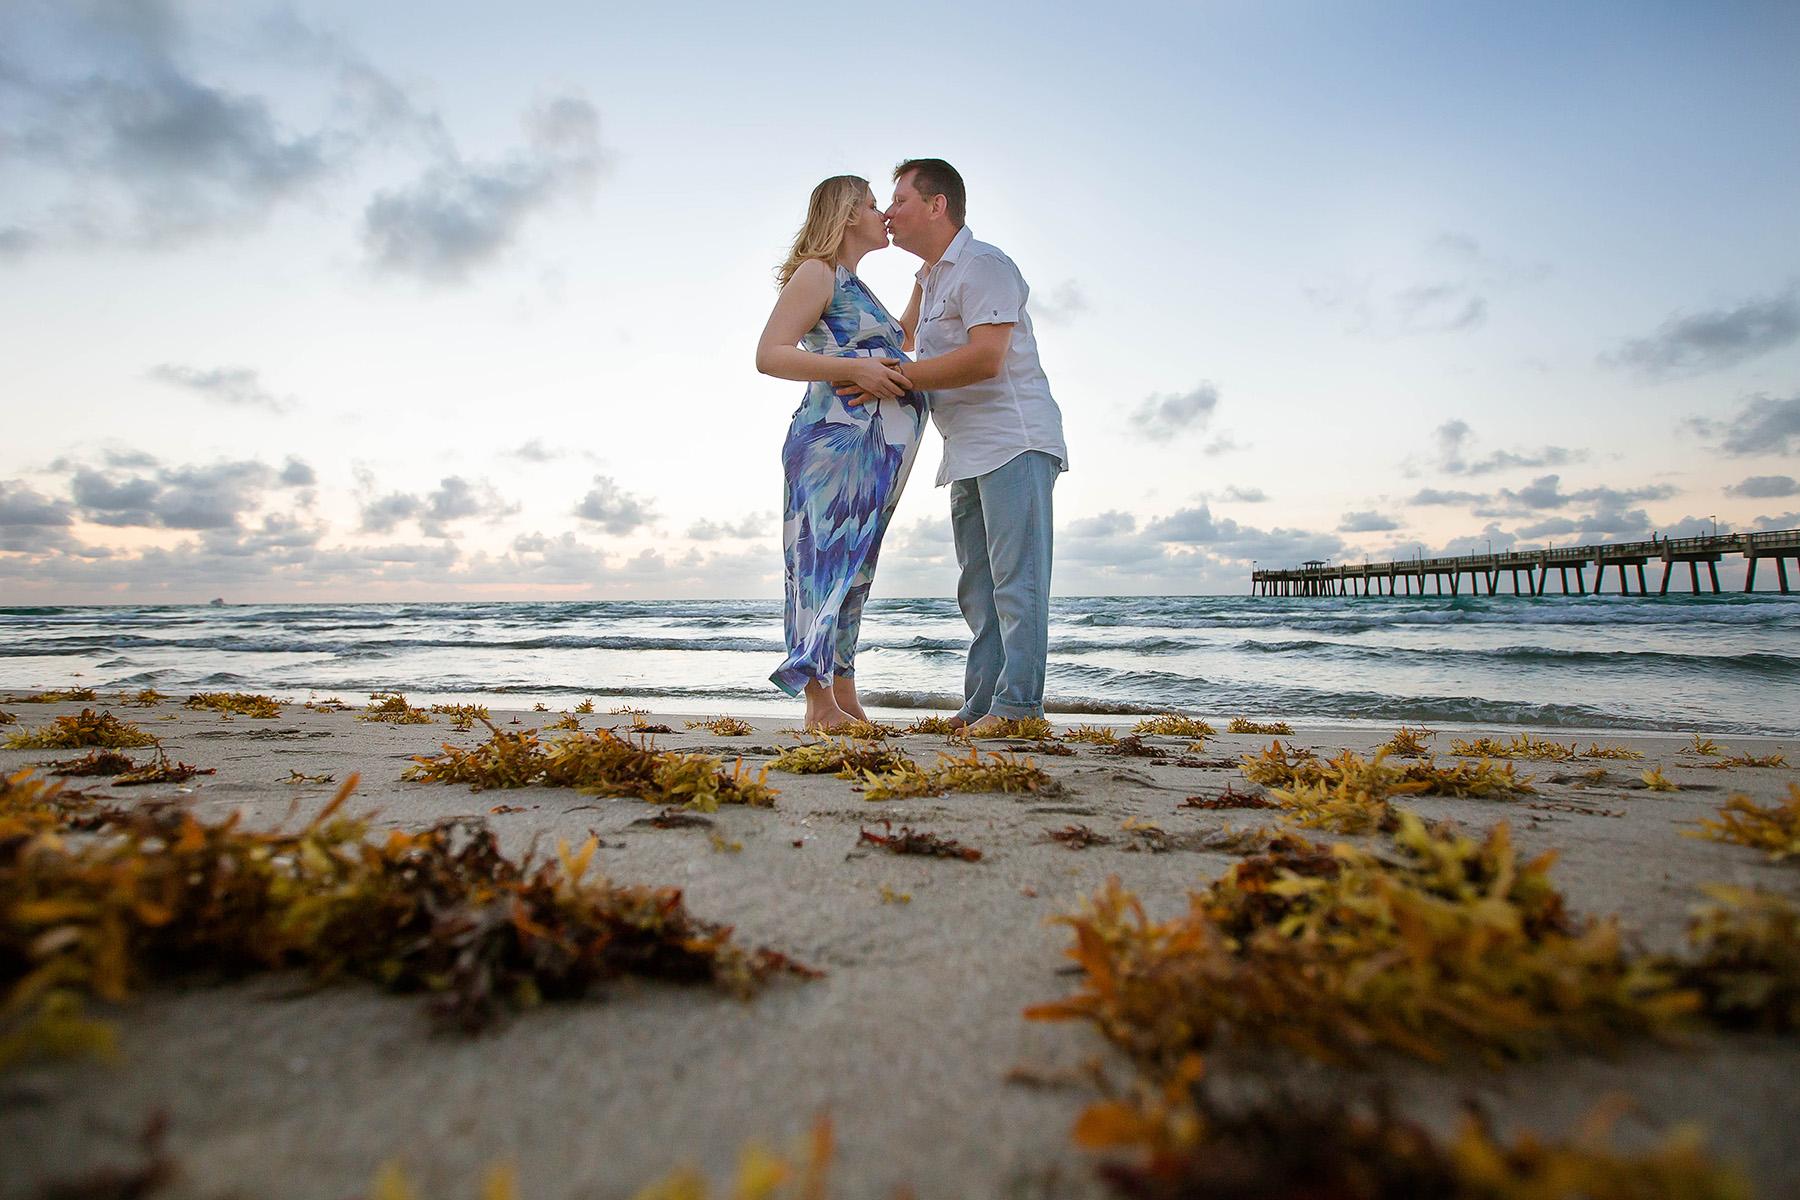 hollywood-pregnancy-photographer-kiss-seaweed-sunrise-portraits.jpg